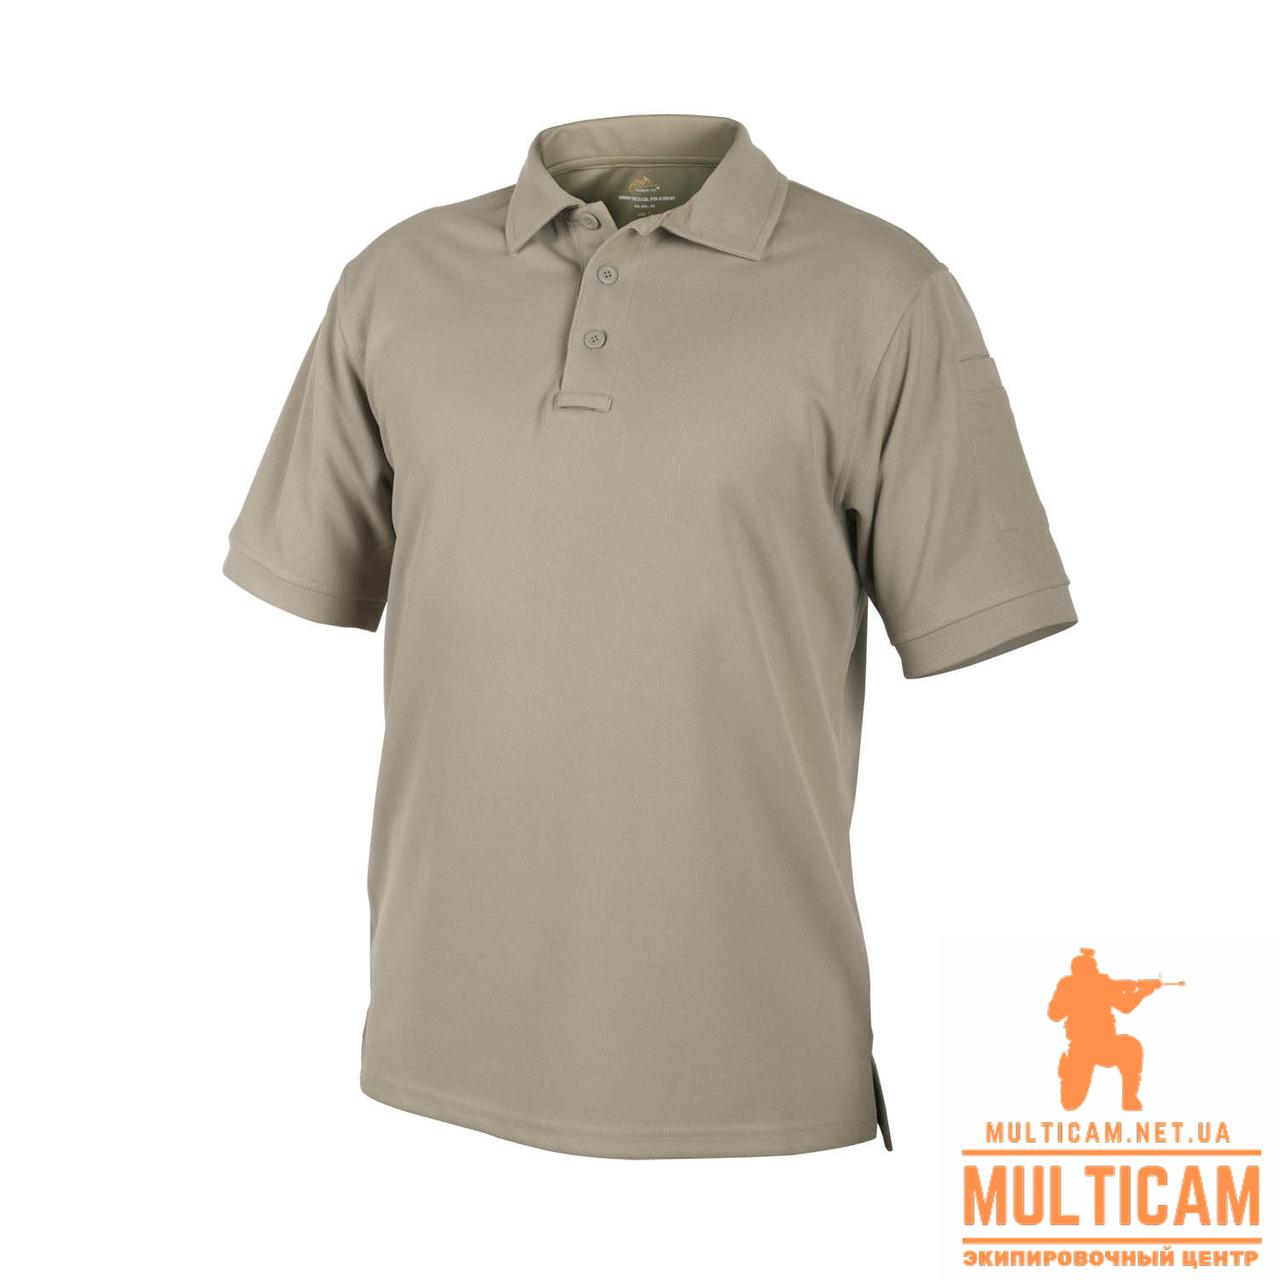 Термофутболка поло Helikon-Tex® UTL Polo Shirt - TopCool® -  Khaki